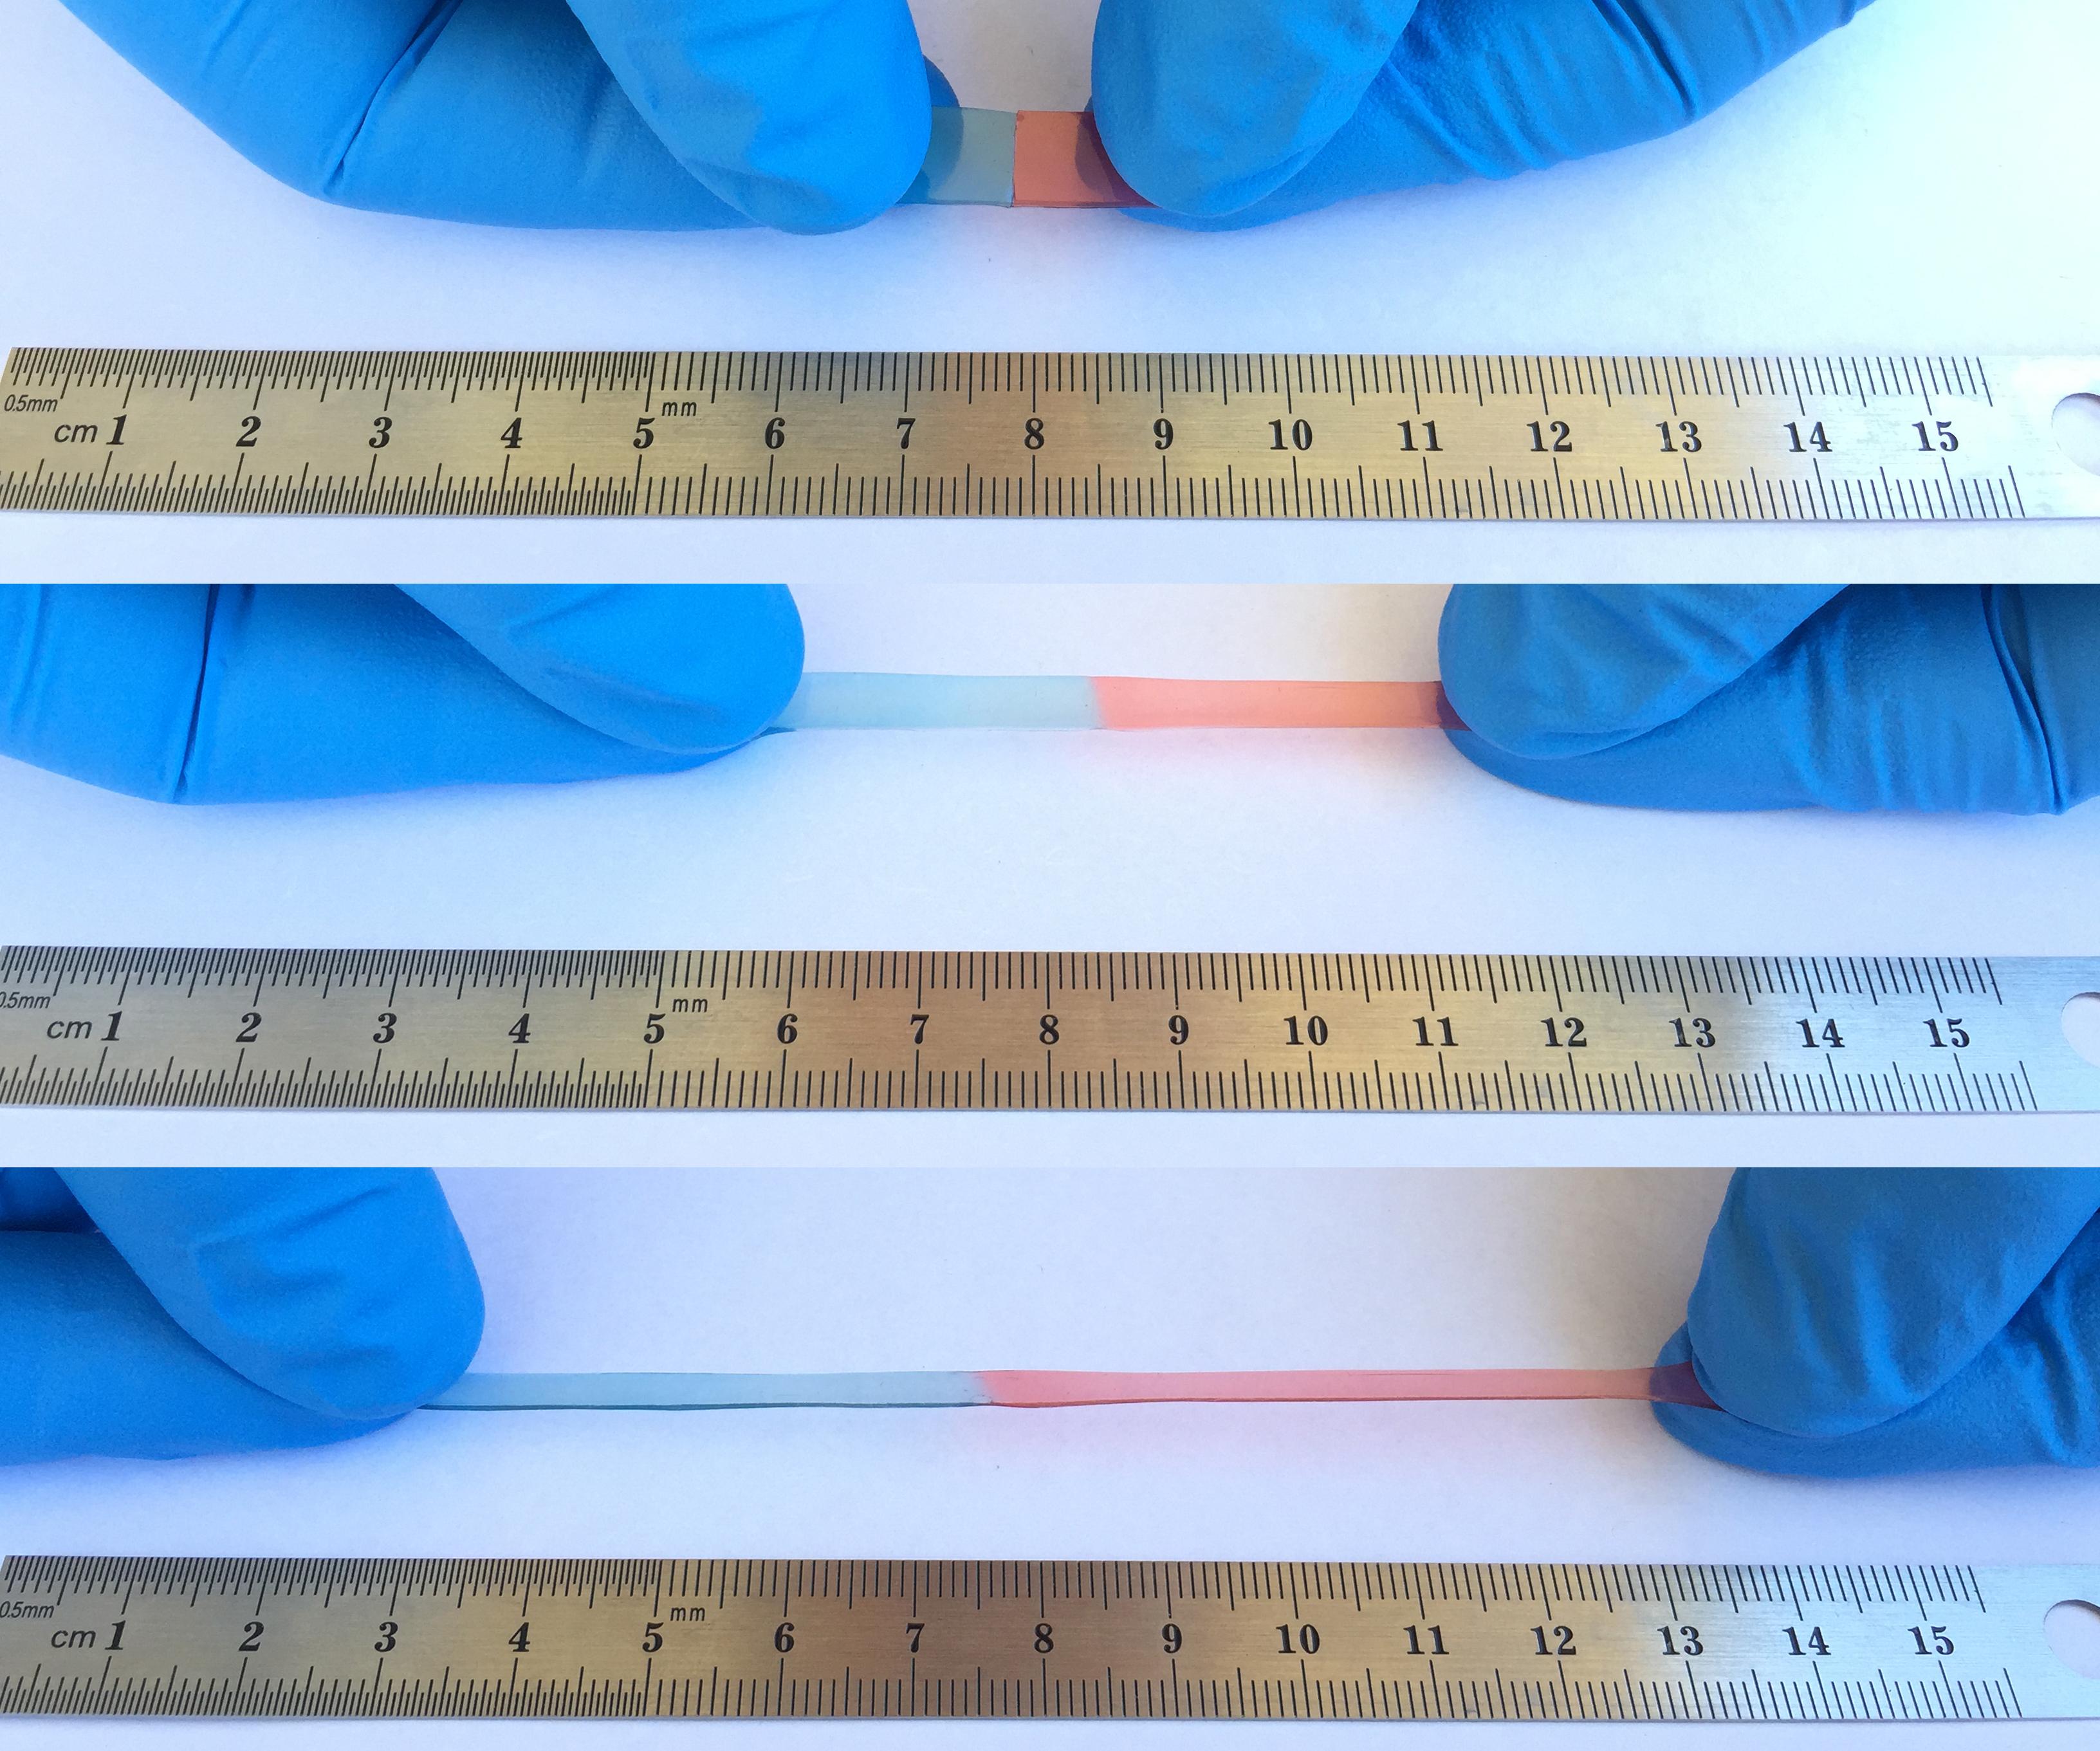 Materials May Lead to Self-Healing Smartphones